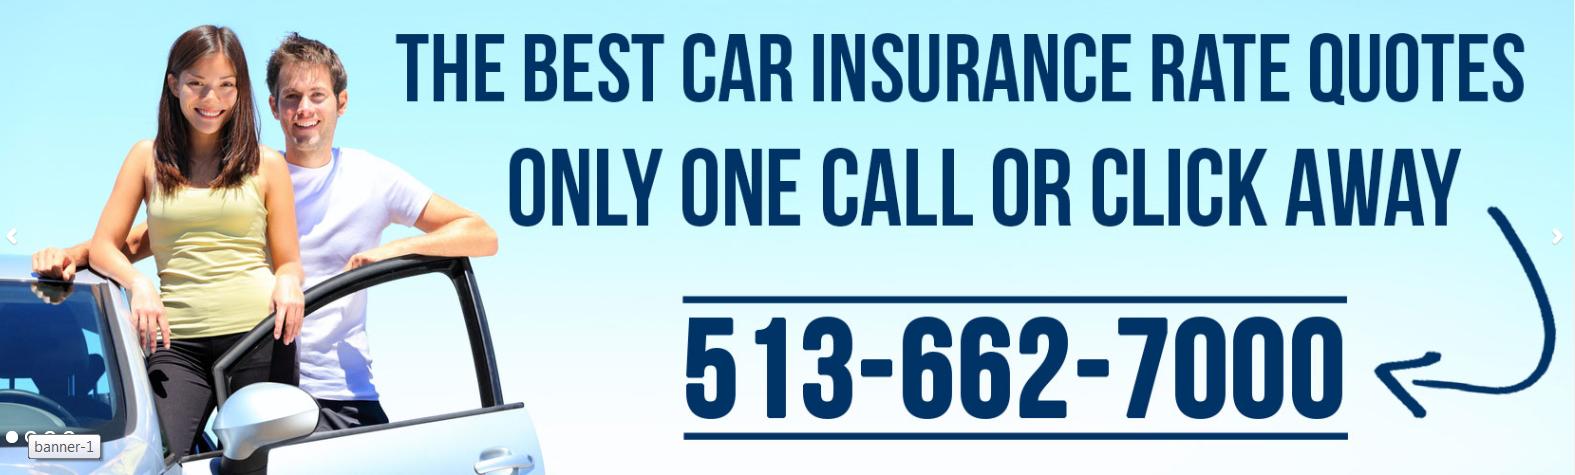 One website Business insurance, Best car insurance rates